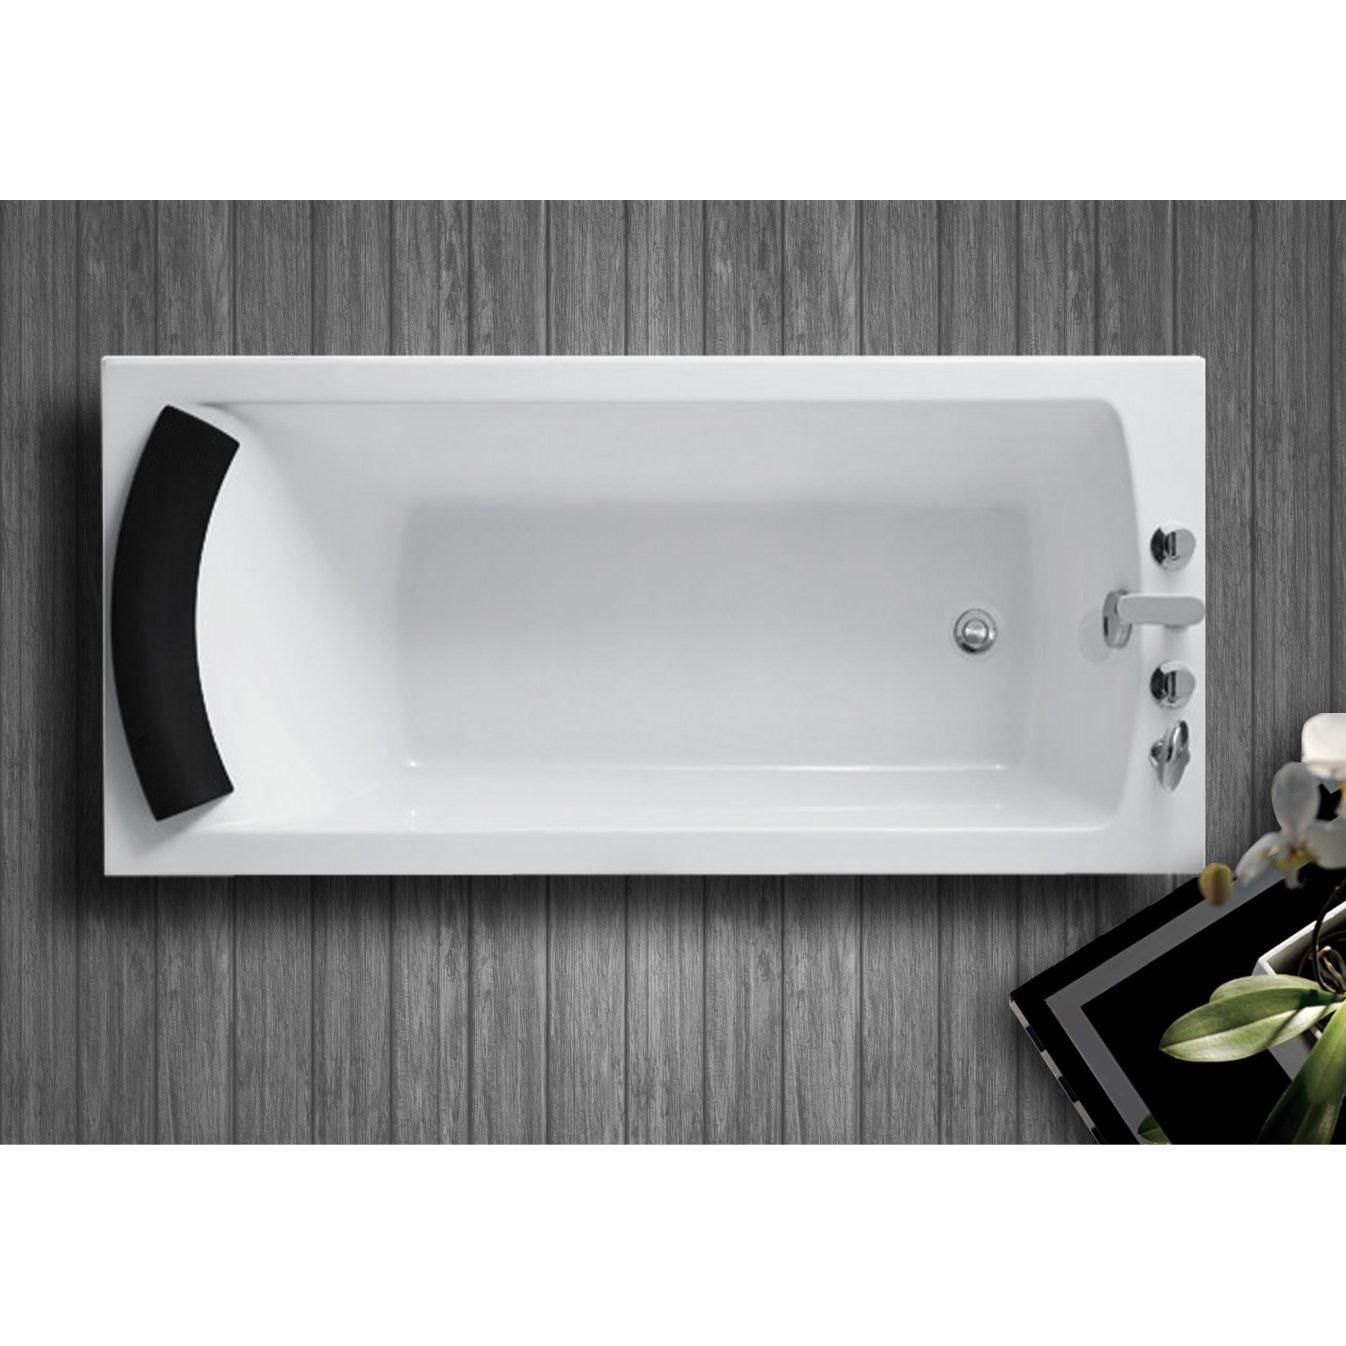 Акриловая ванна Royal bath Vienna RB953202 160х70 каркас сварной к ванне royal bath vienna 150 rb953201k